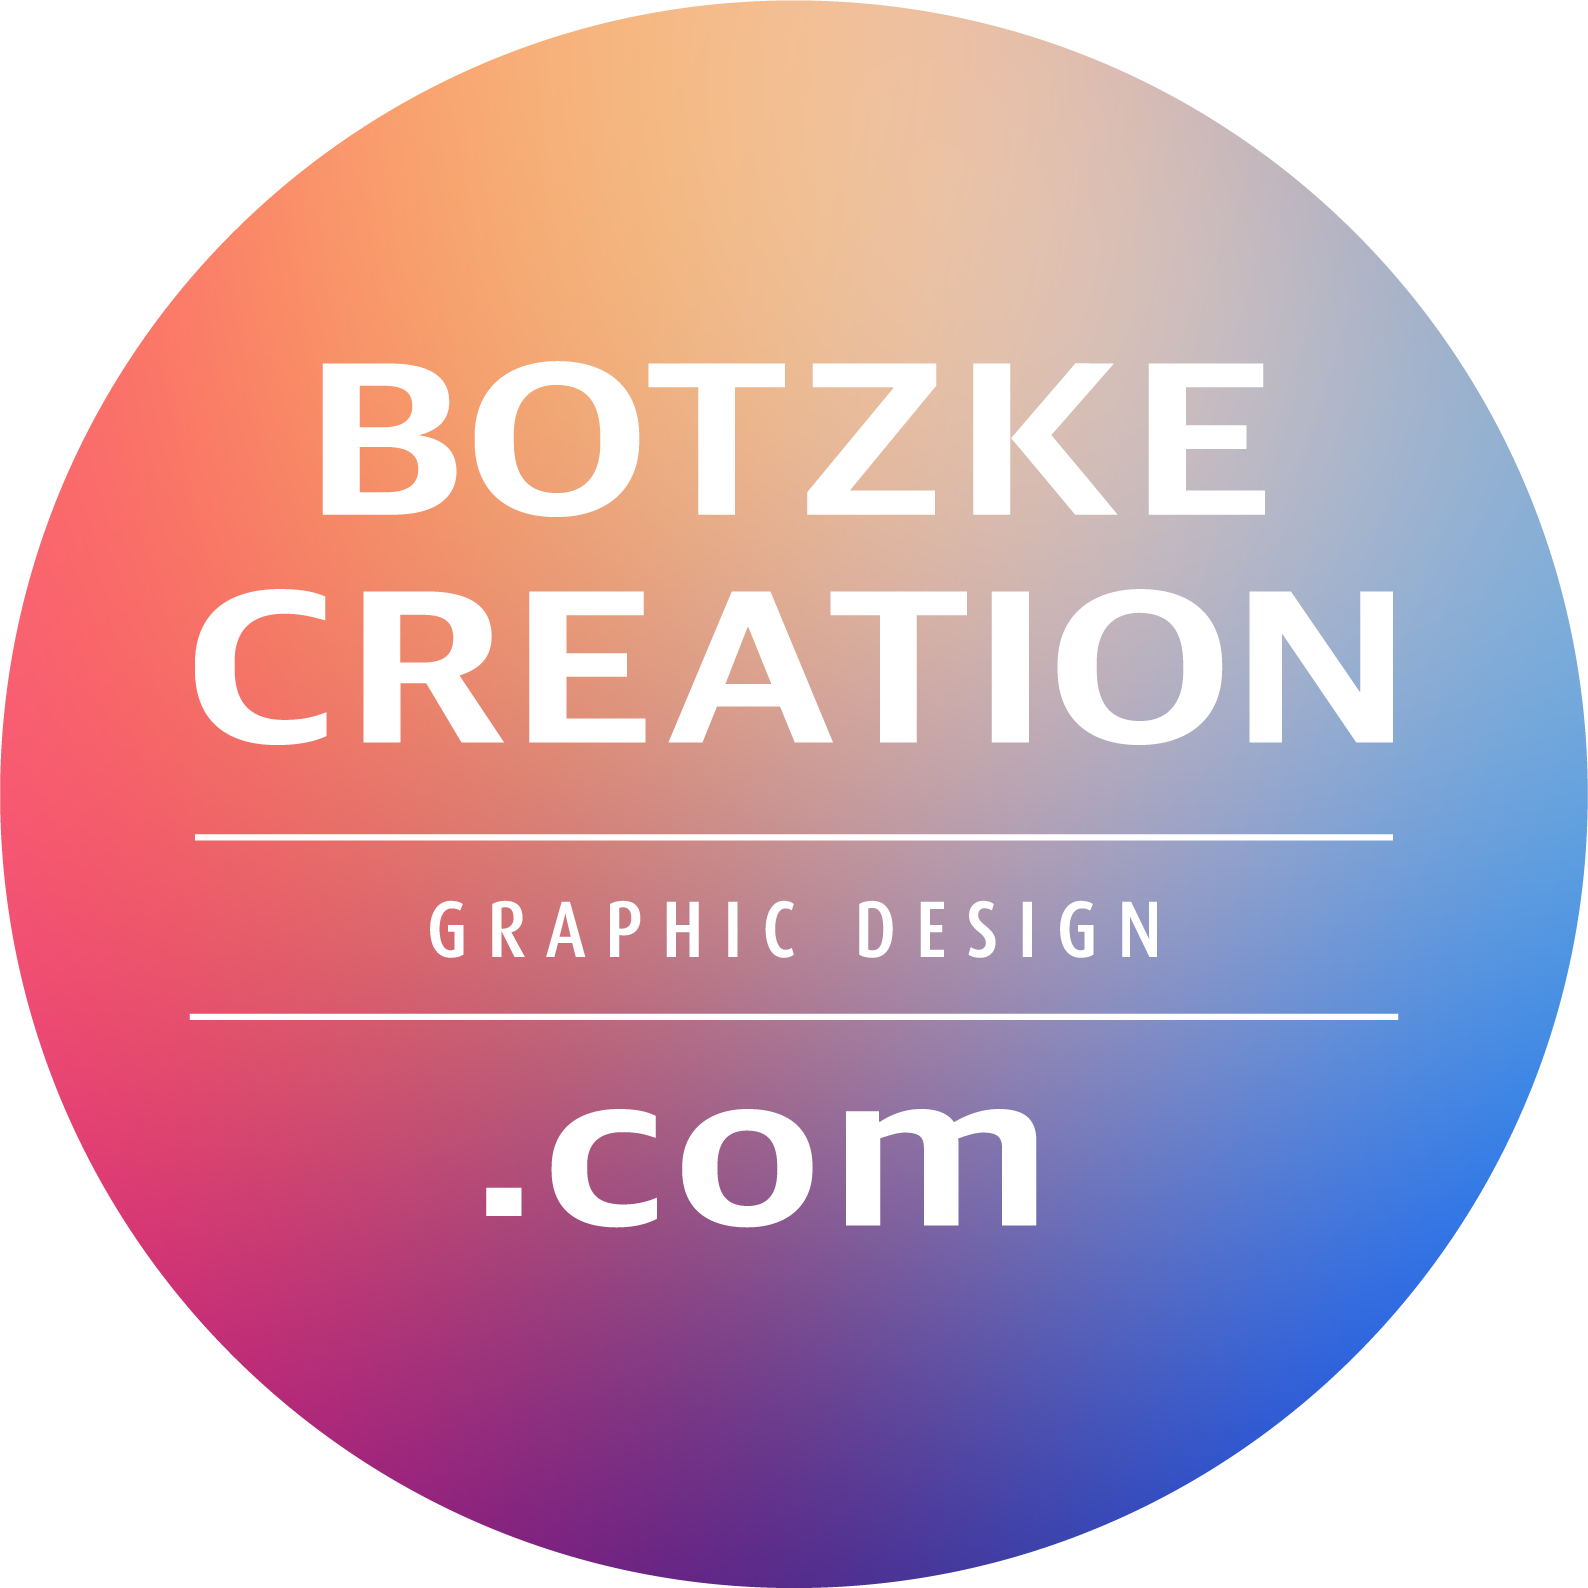 Botzke Creation